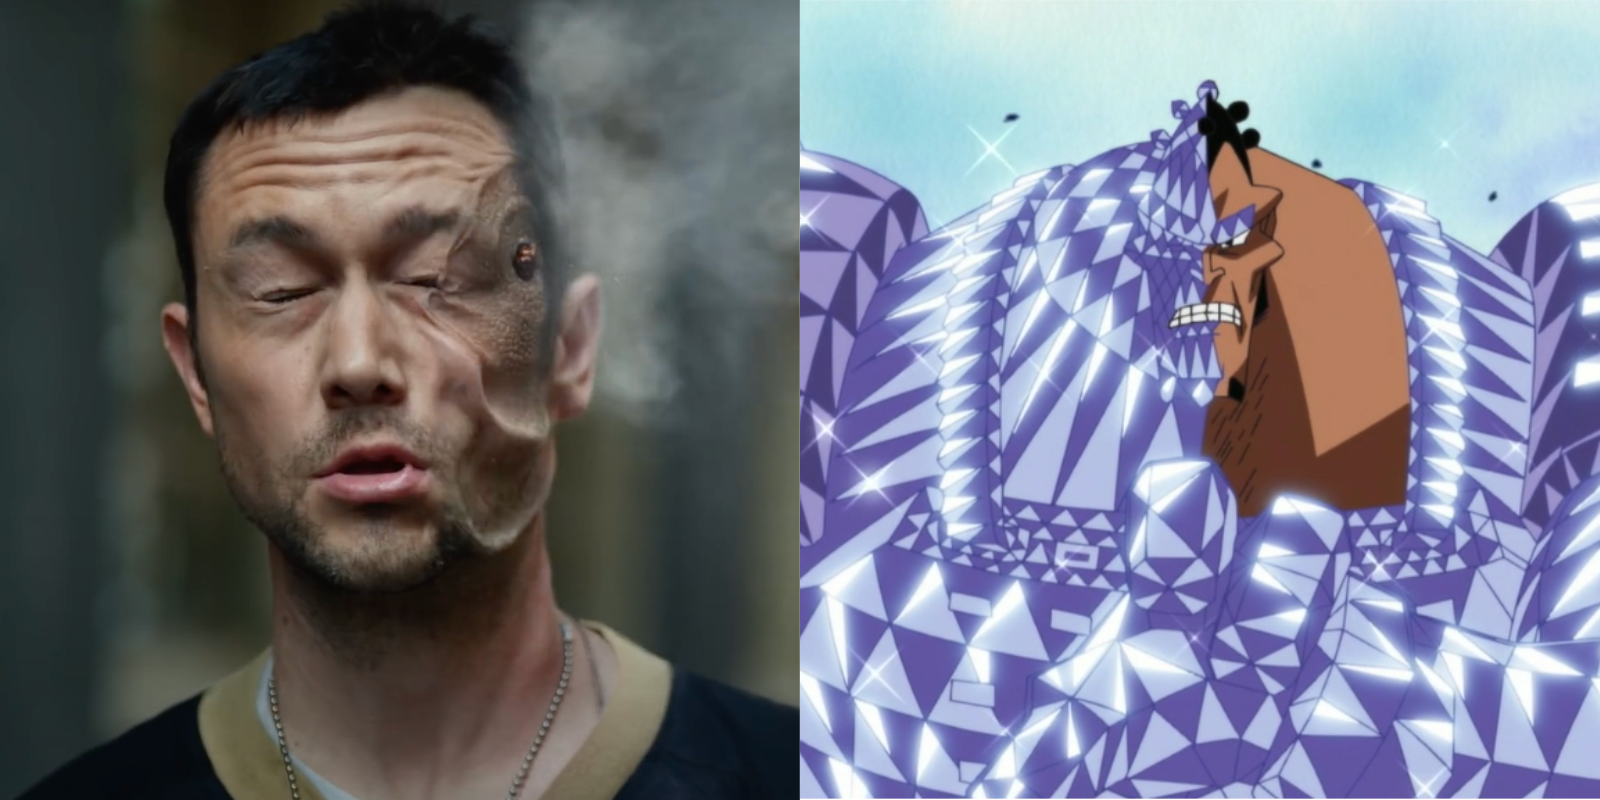 Joseph Gordon-Levitt in Project Power resembles Jozu in One Piece